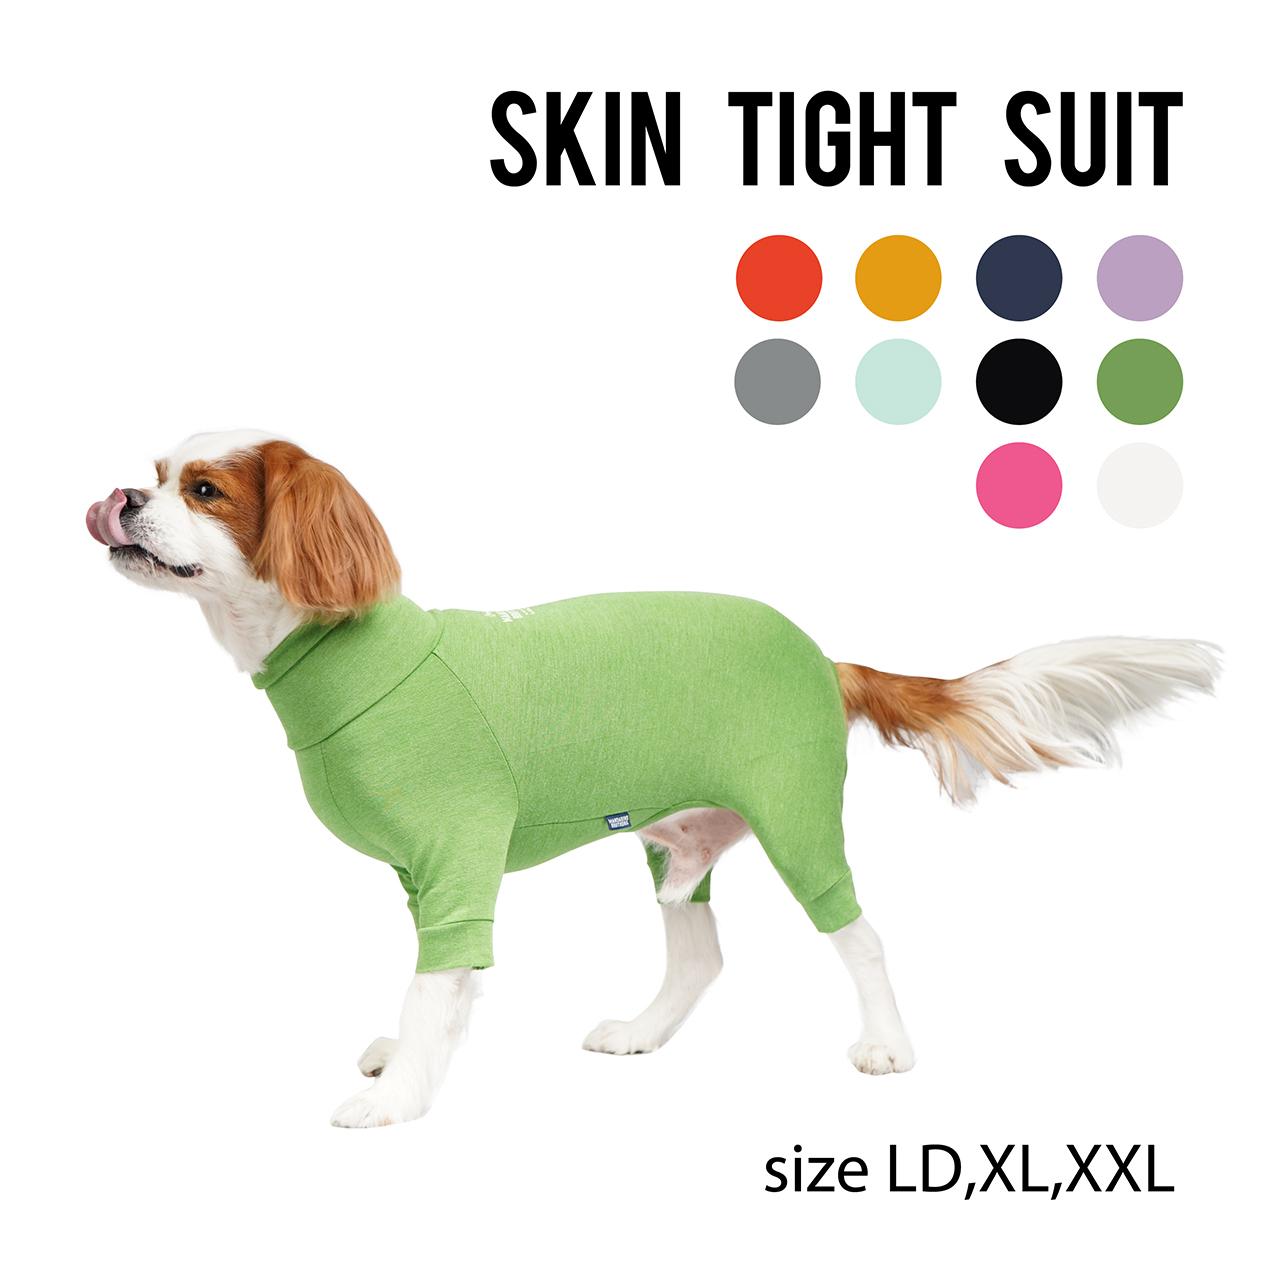 SKIN TIGHT SUITS(LD,XL,XXL) スキンタイトスーツ